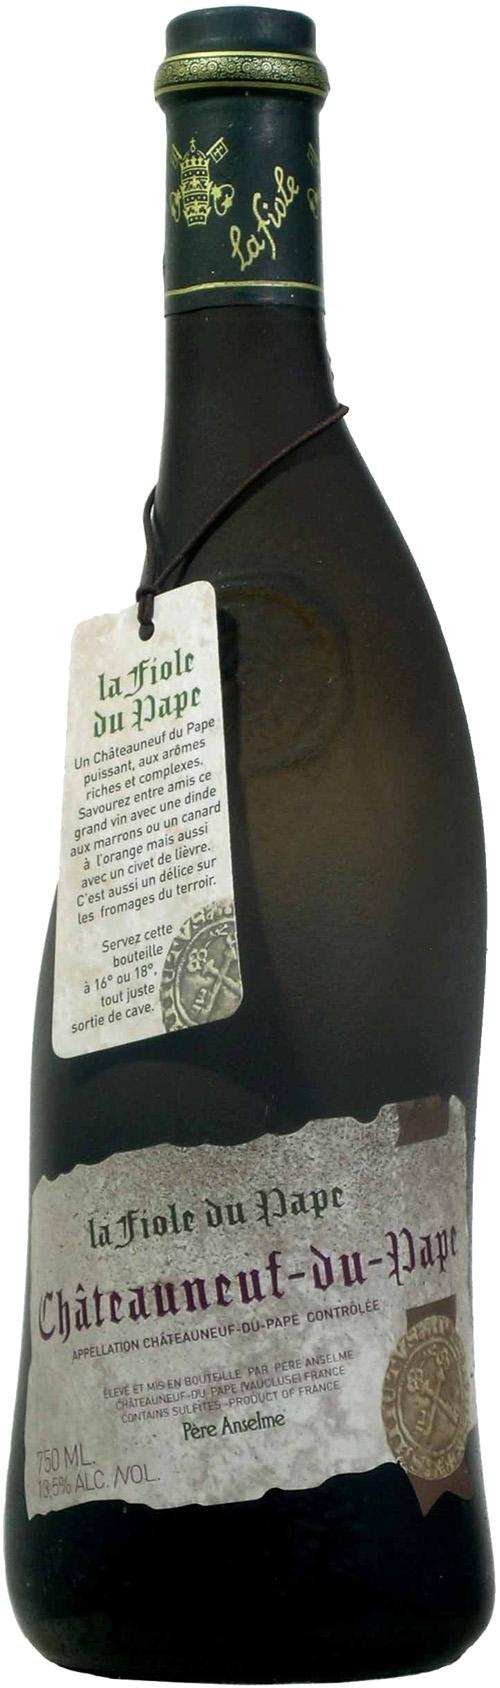 la fiole du pape ch teauneuf du pape aoc from rhone valley france wines we like pinterest. Black Bedroom Furniture Sets. Home Design Ideas